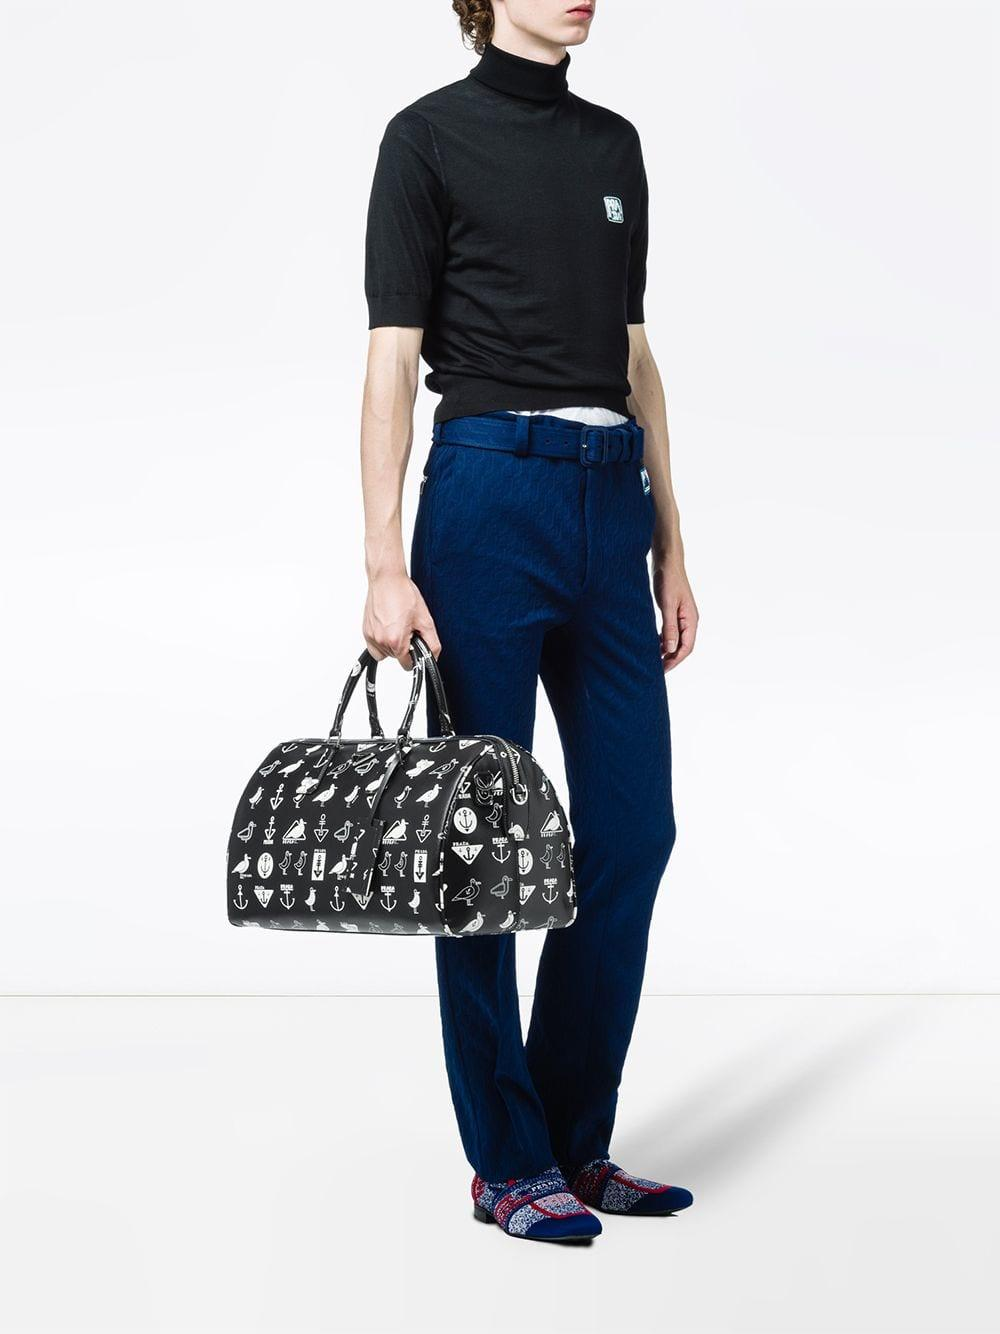 7443ac0bc452 Prada - Black Printed Saffiano Leather Travel Bag for Men - Lyst. View  fullscreen